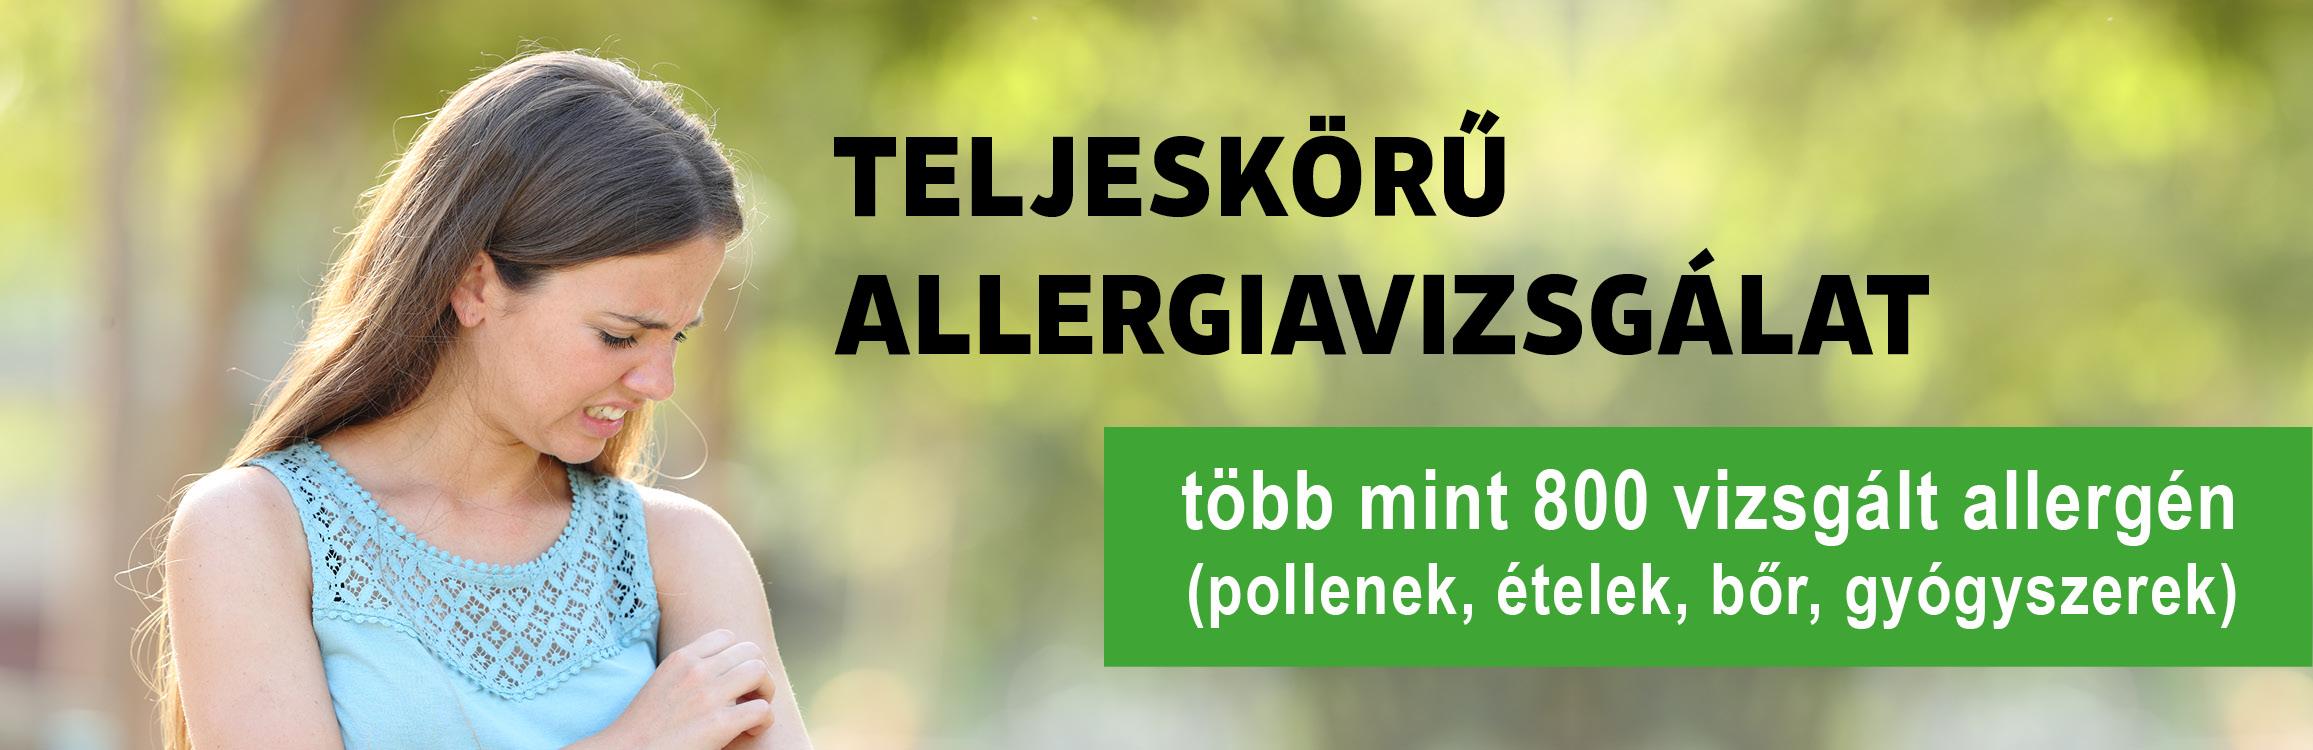 Teljeskörű allergiavizsgálat